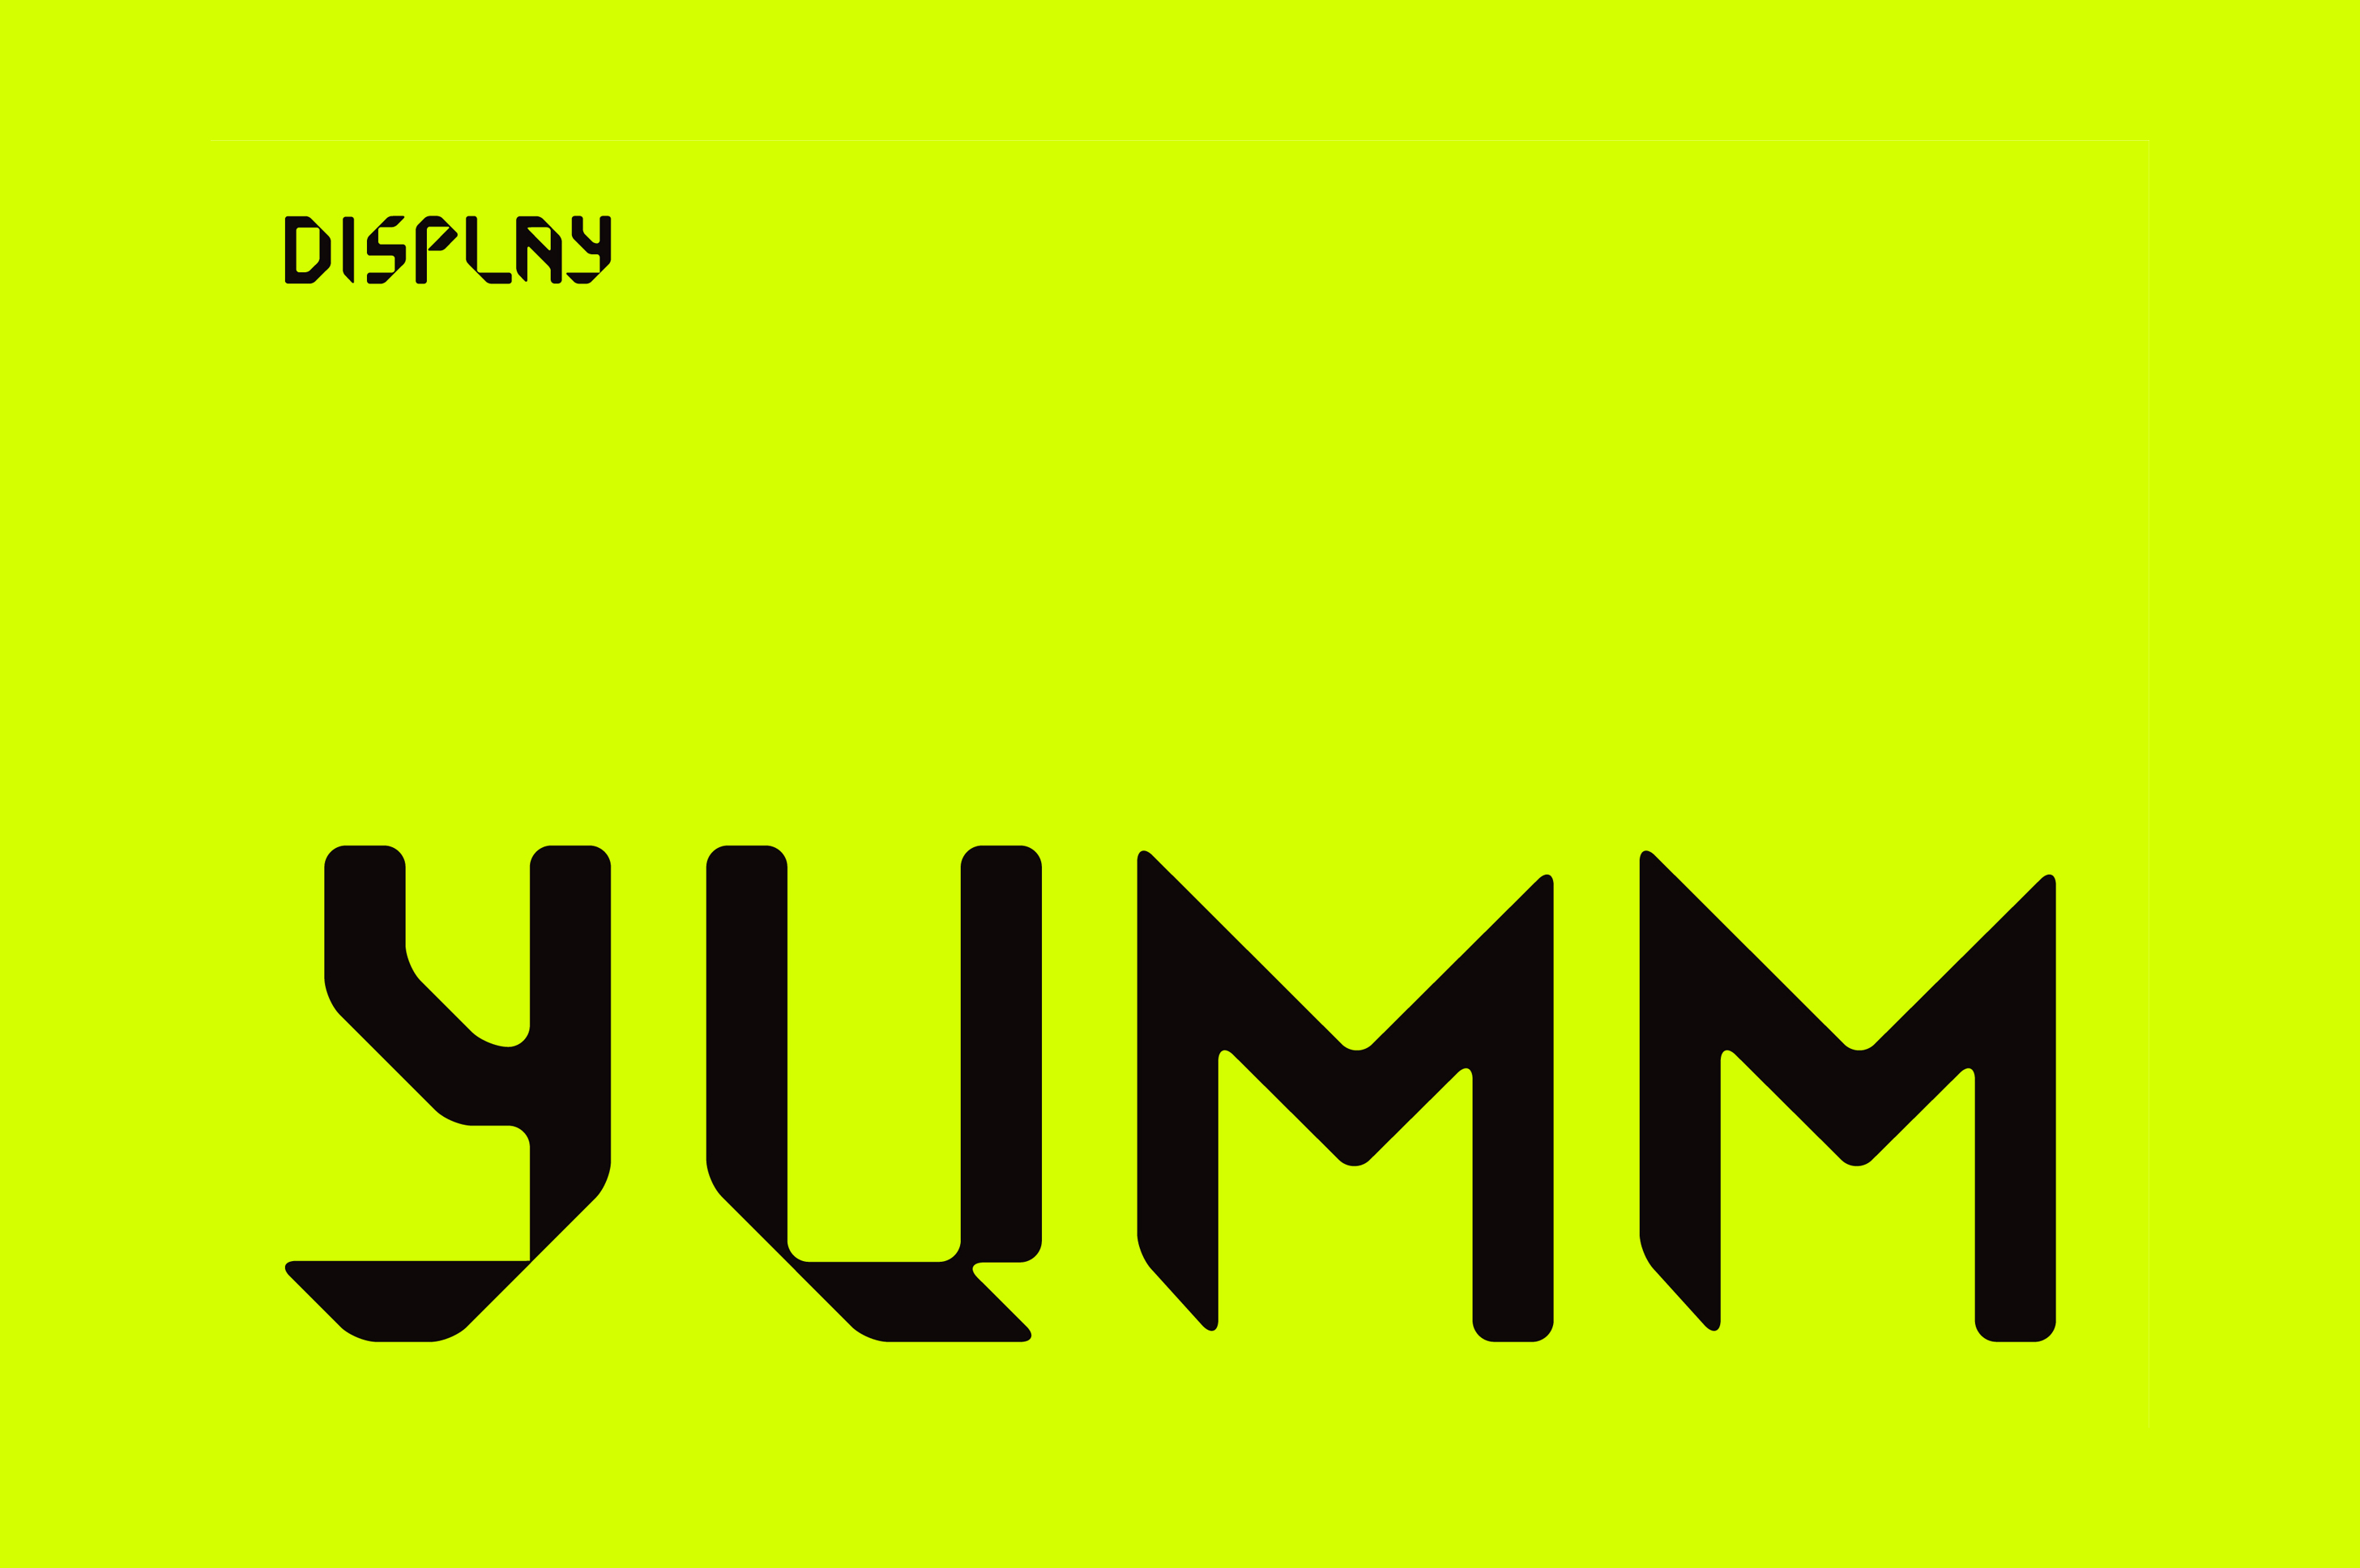 YUMM SANS TYPE